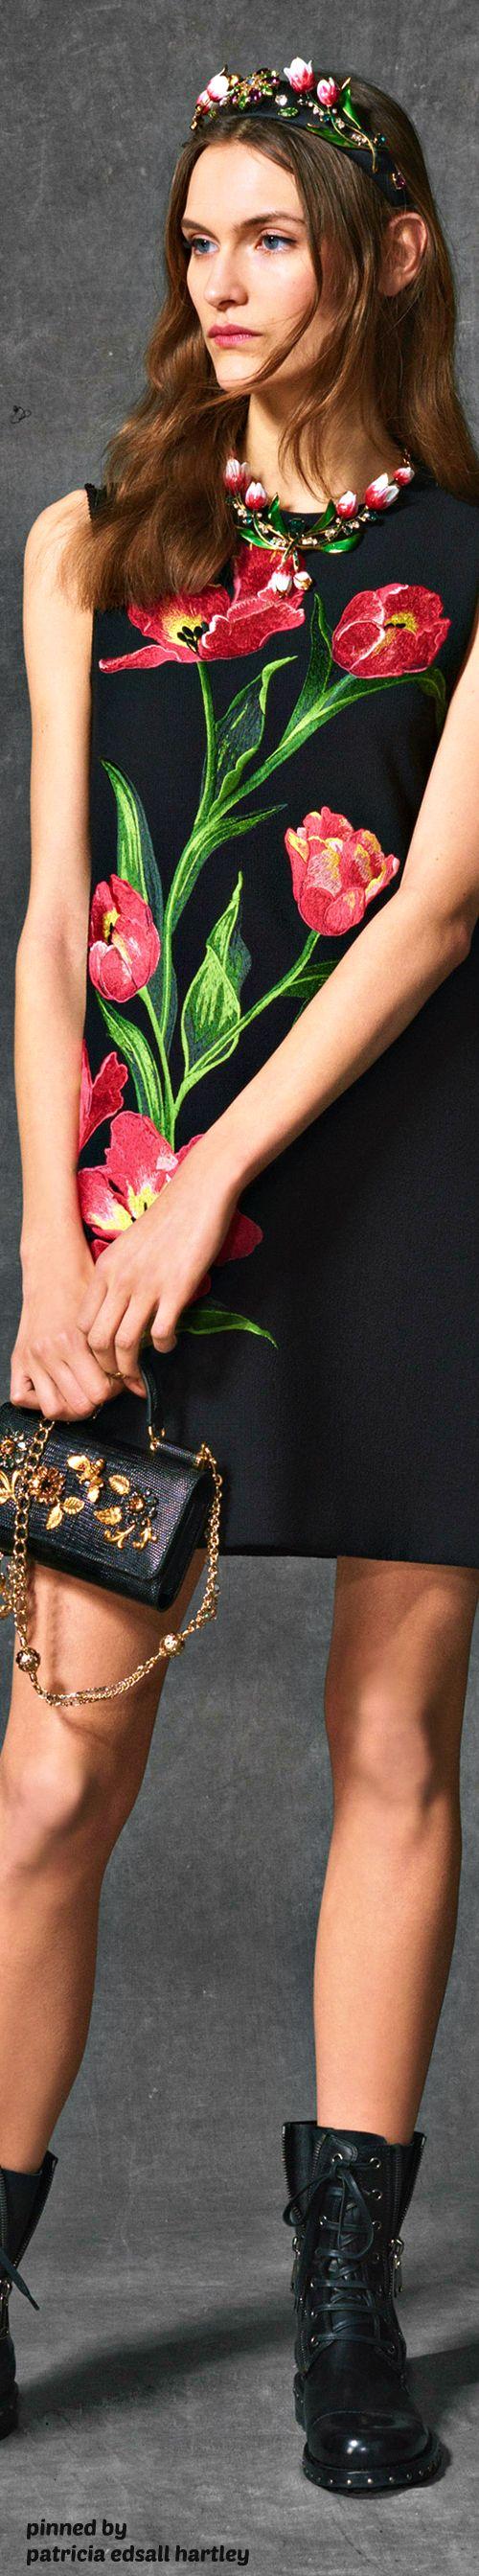 Dolce & Gabbana - FW 2017 - Tulips